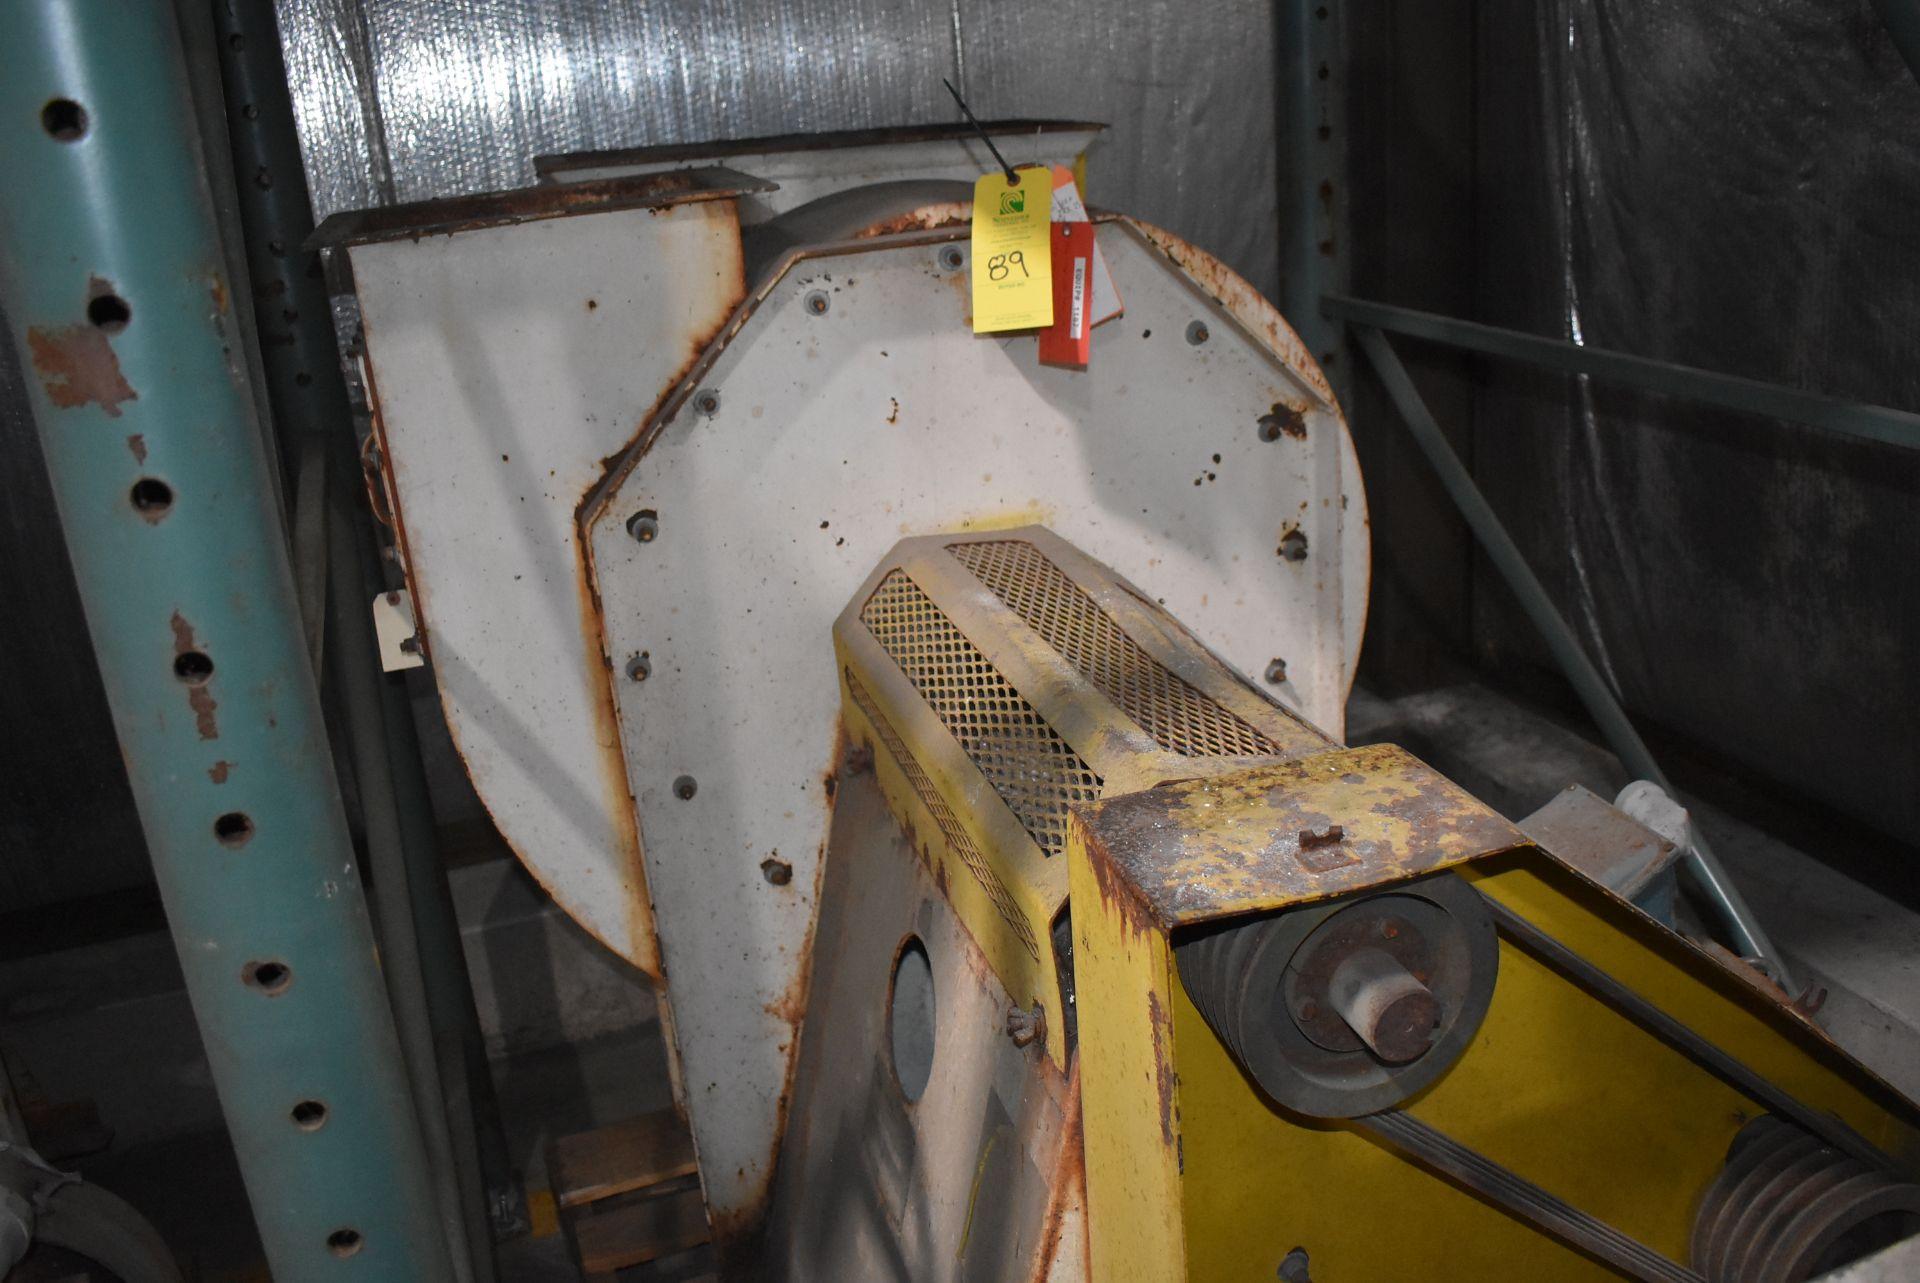 Air Tech Model #261 Blower w/20 HP Motor